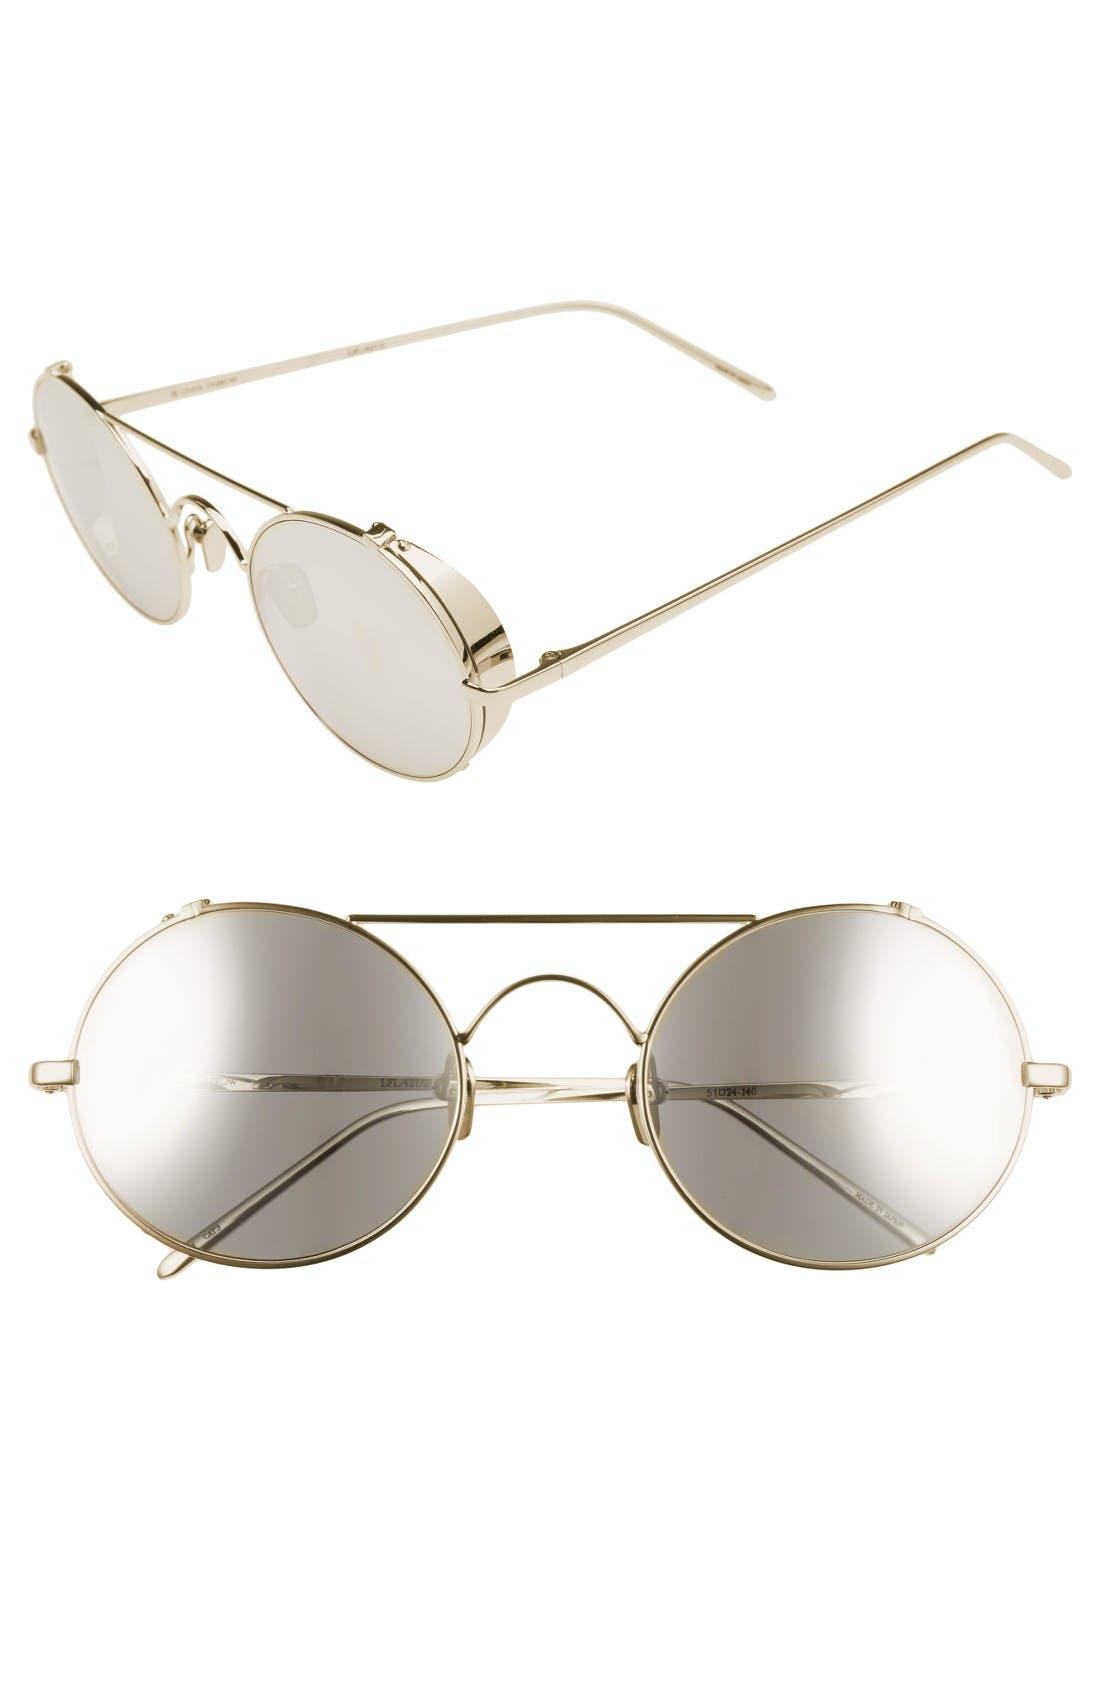 LINDA FARROW 51mm Oval Sunglasses